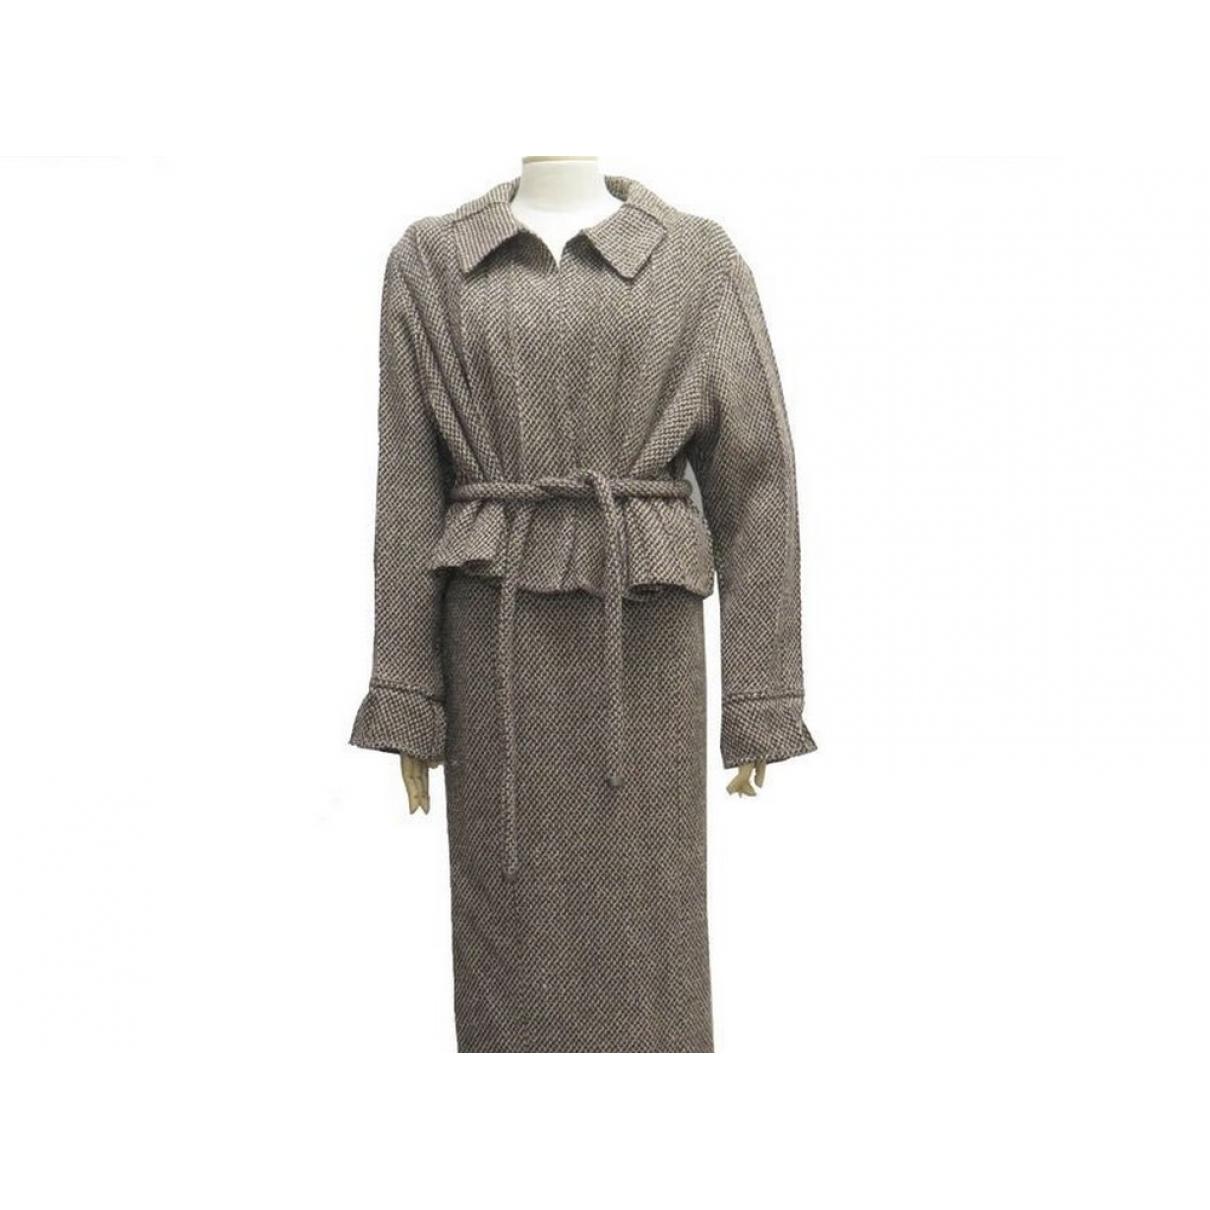 Chanel \N Brown Wool jacket for Women S International